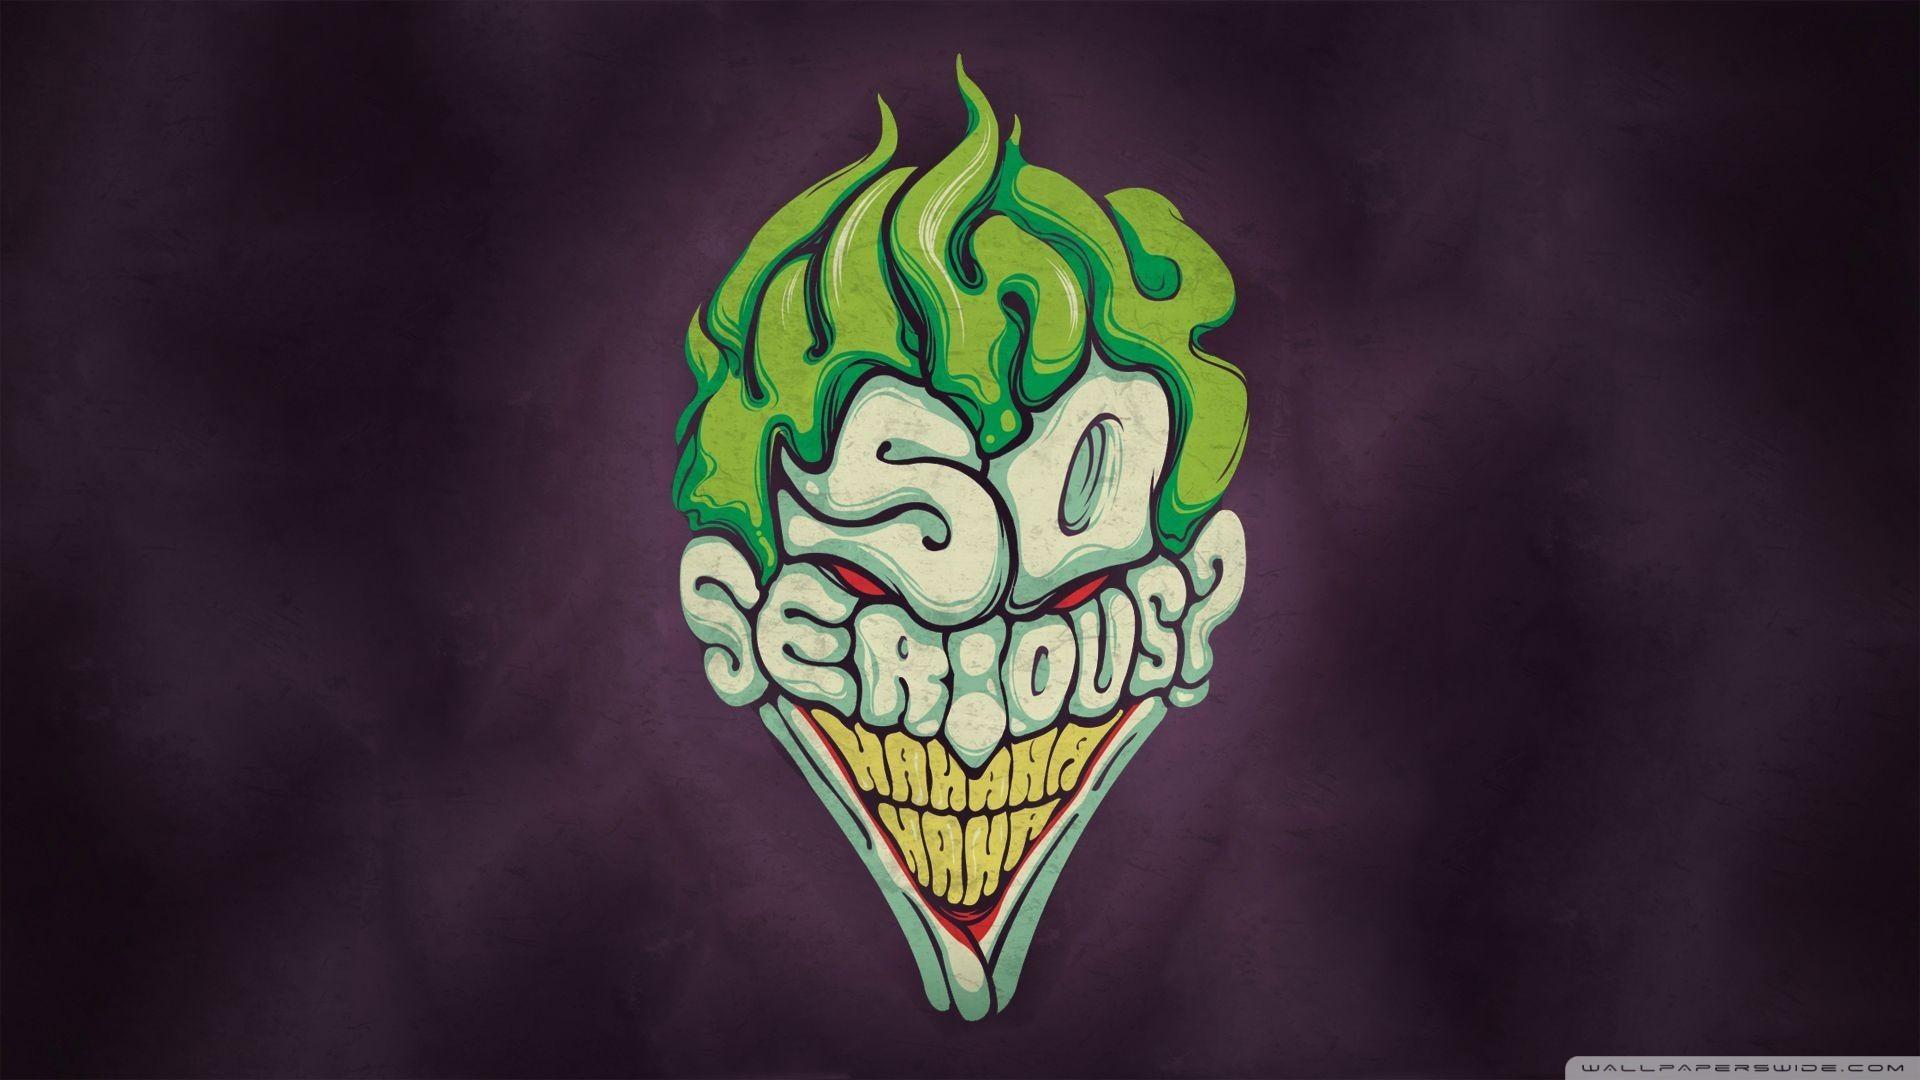 Joker Why So Serious Wallpaper Wallpapertag